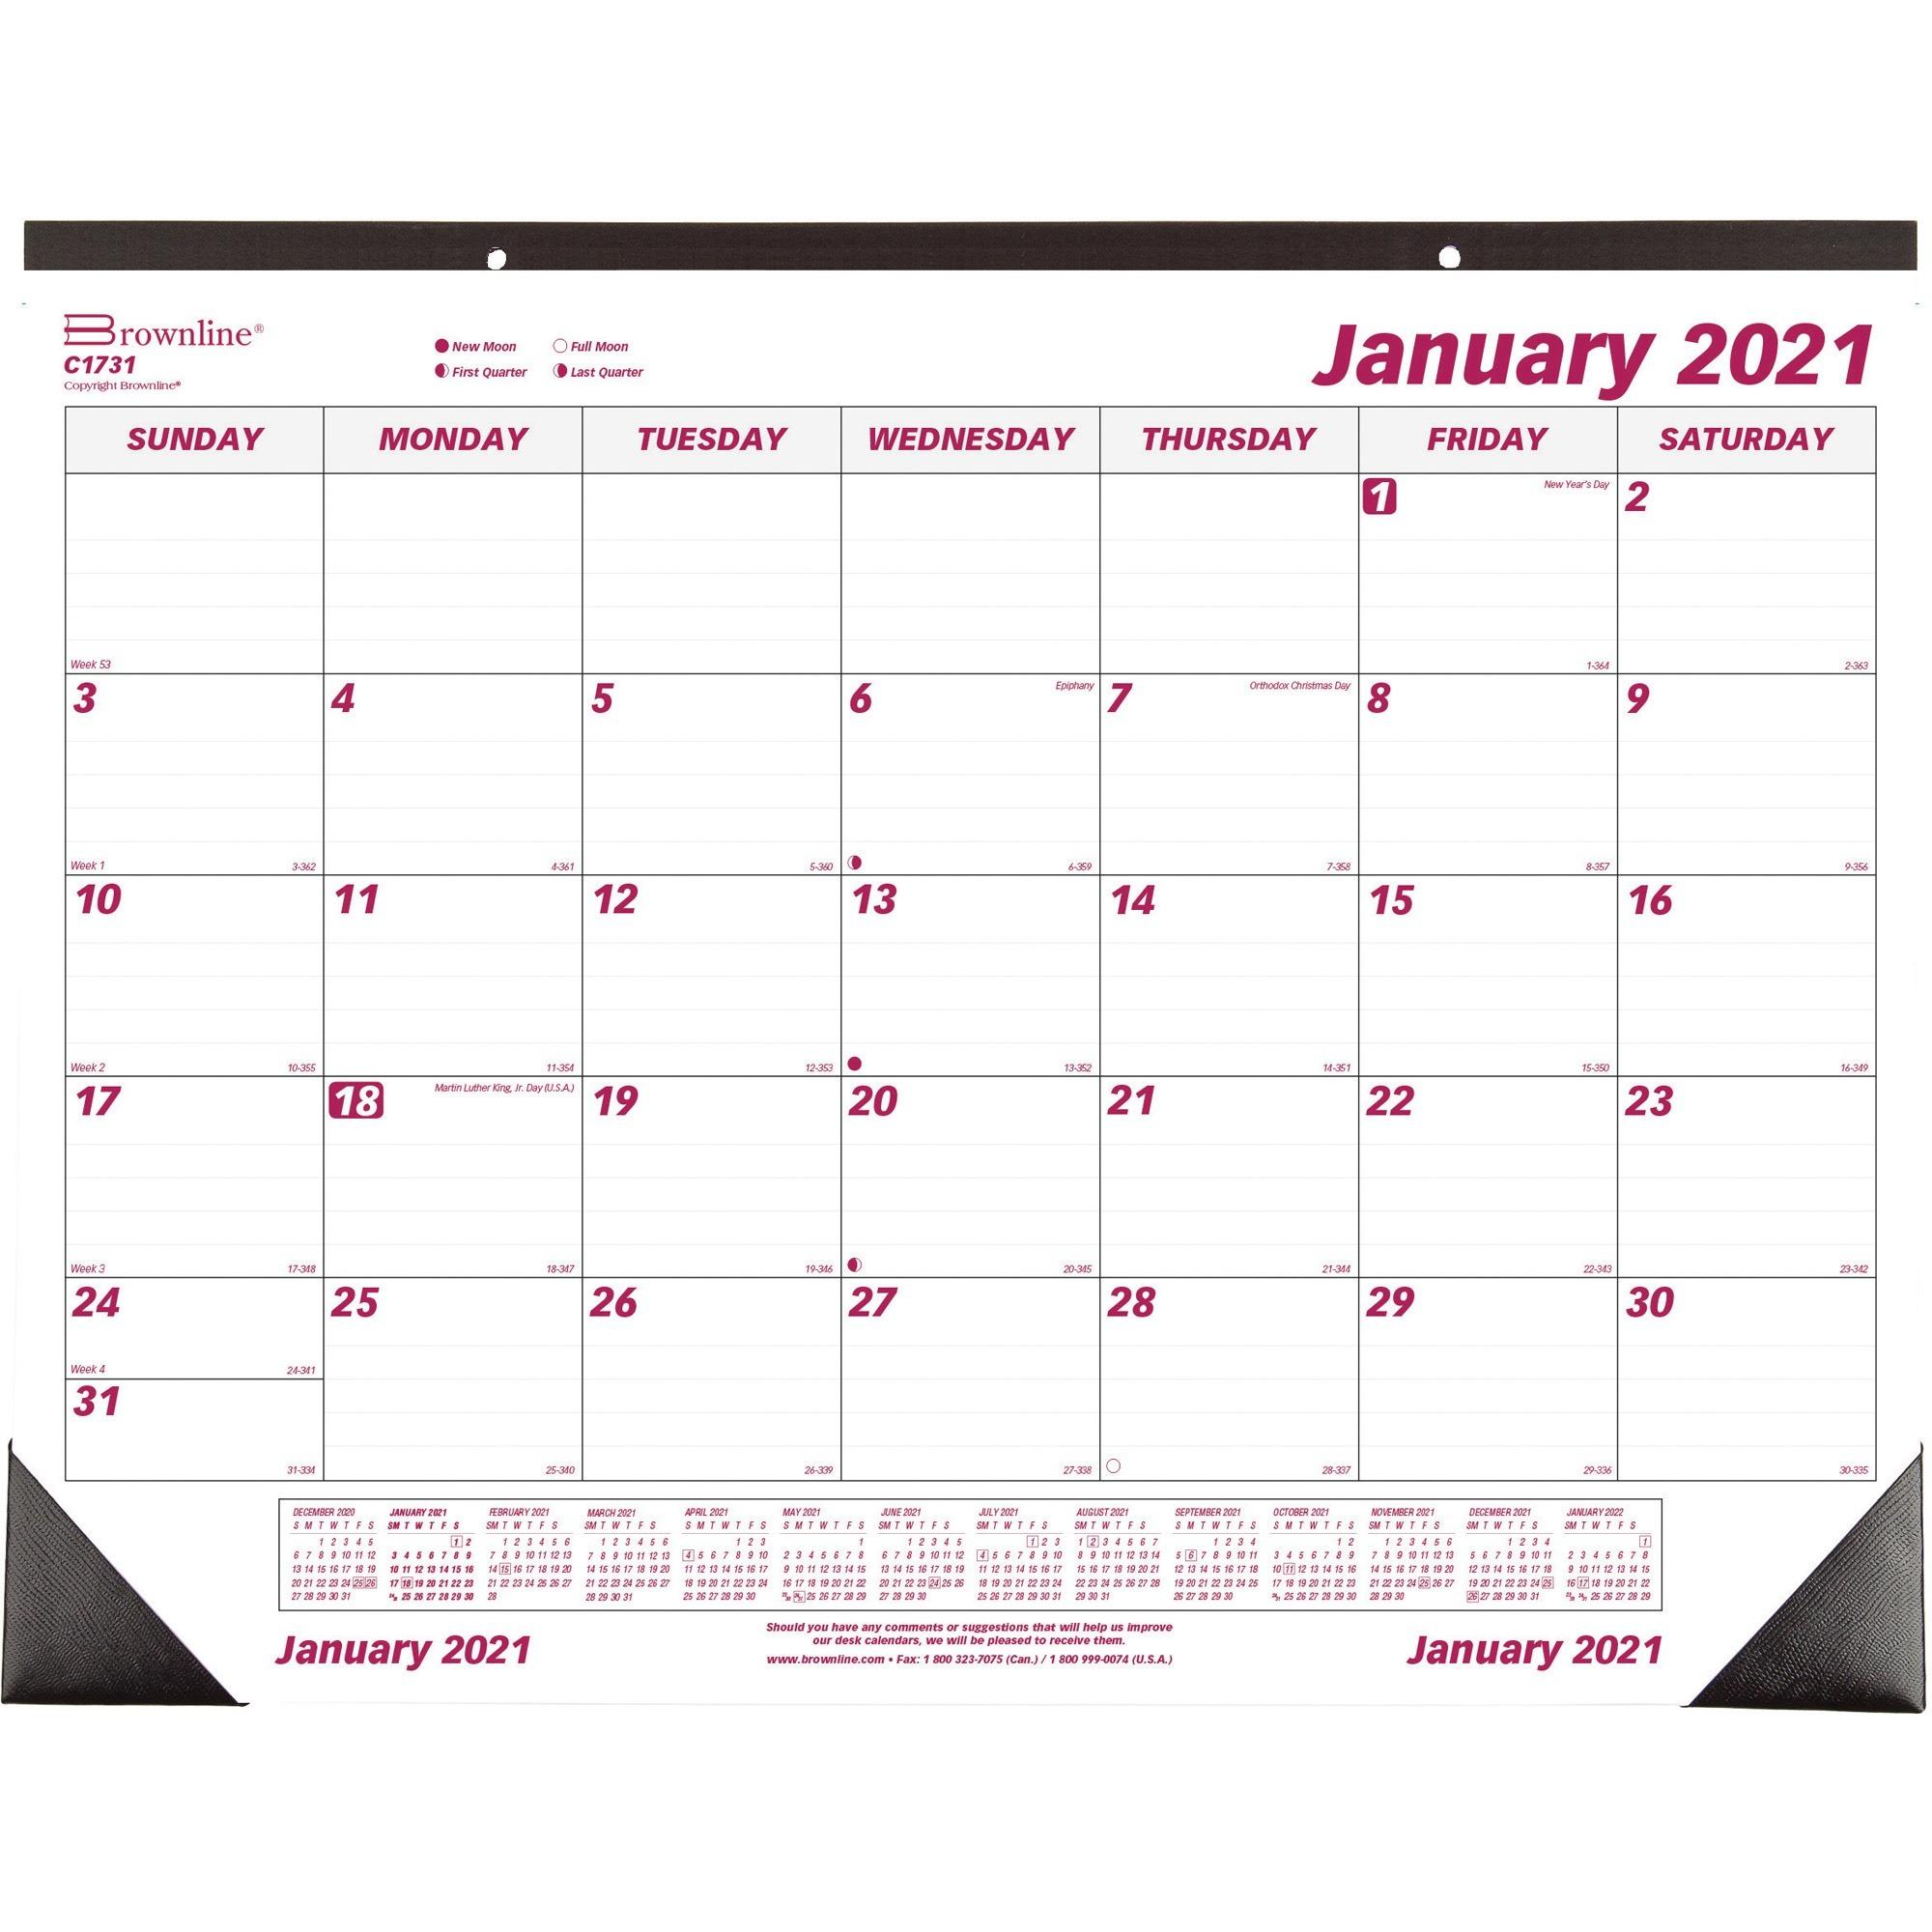 Brownline Professional Monthly Desk/Wall Calendar in 2021 Julian Calendar